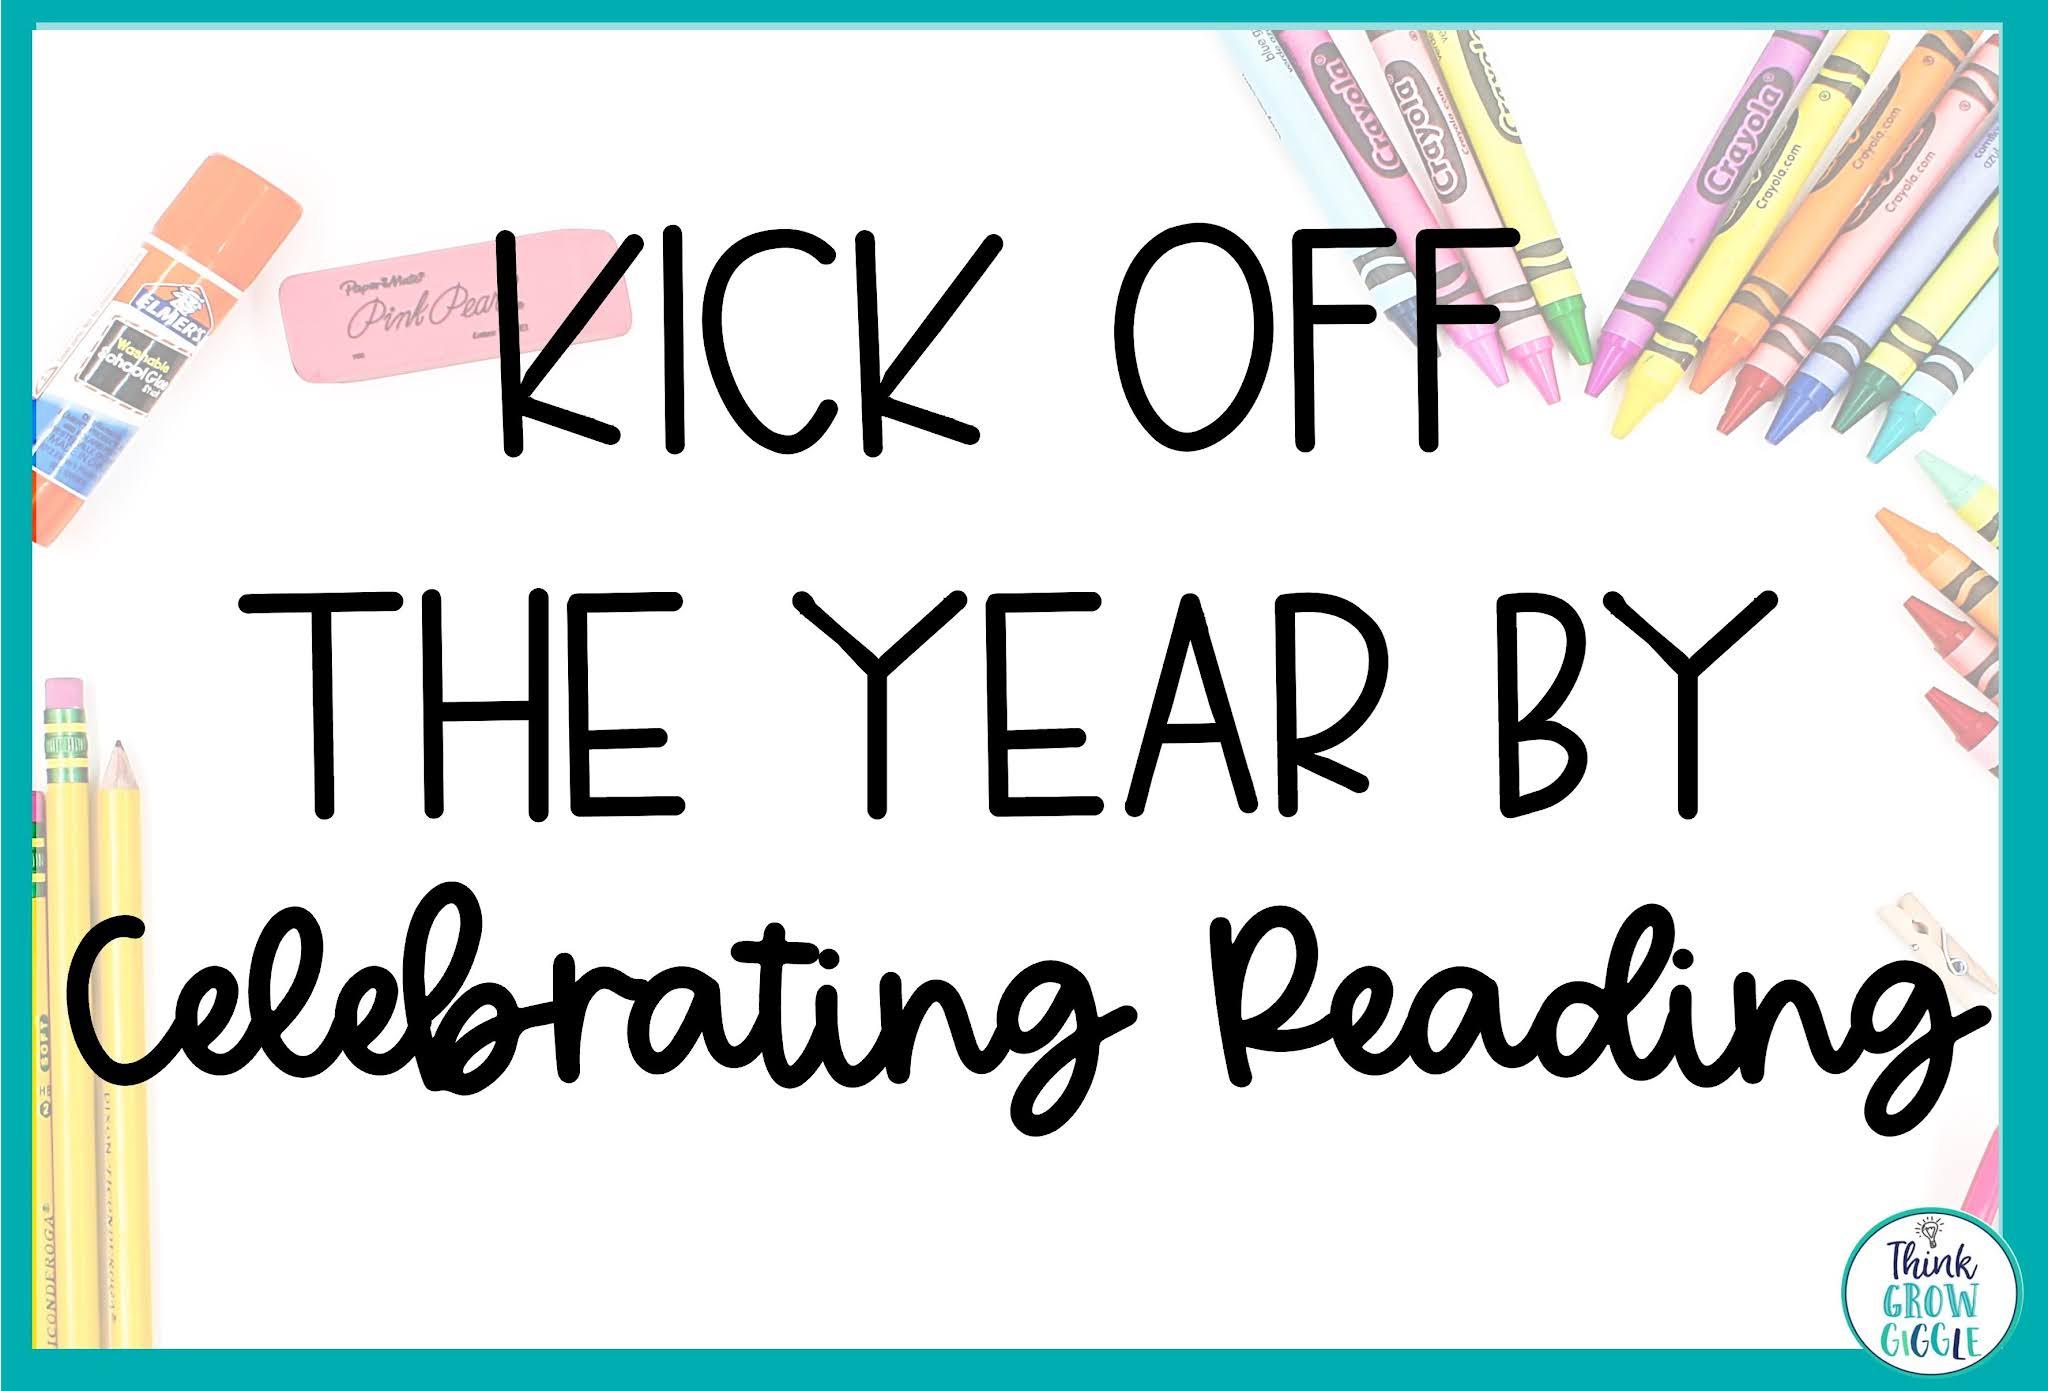 Celebrating Reading 20 Day Kickoff for Upper Elementary